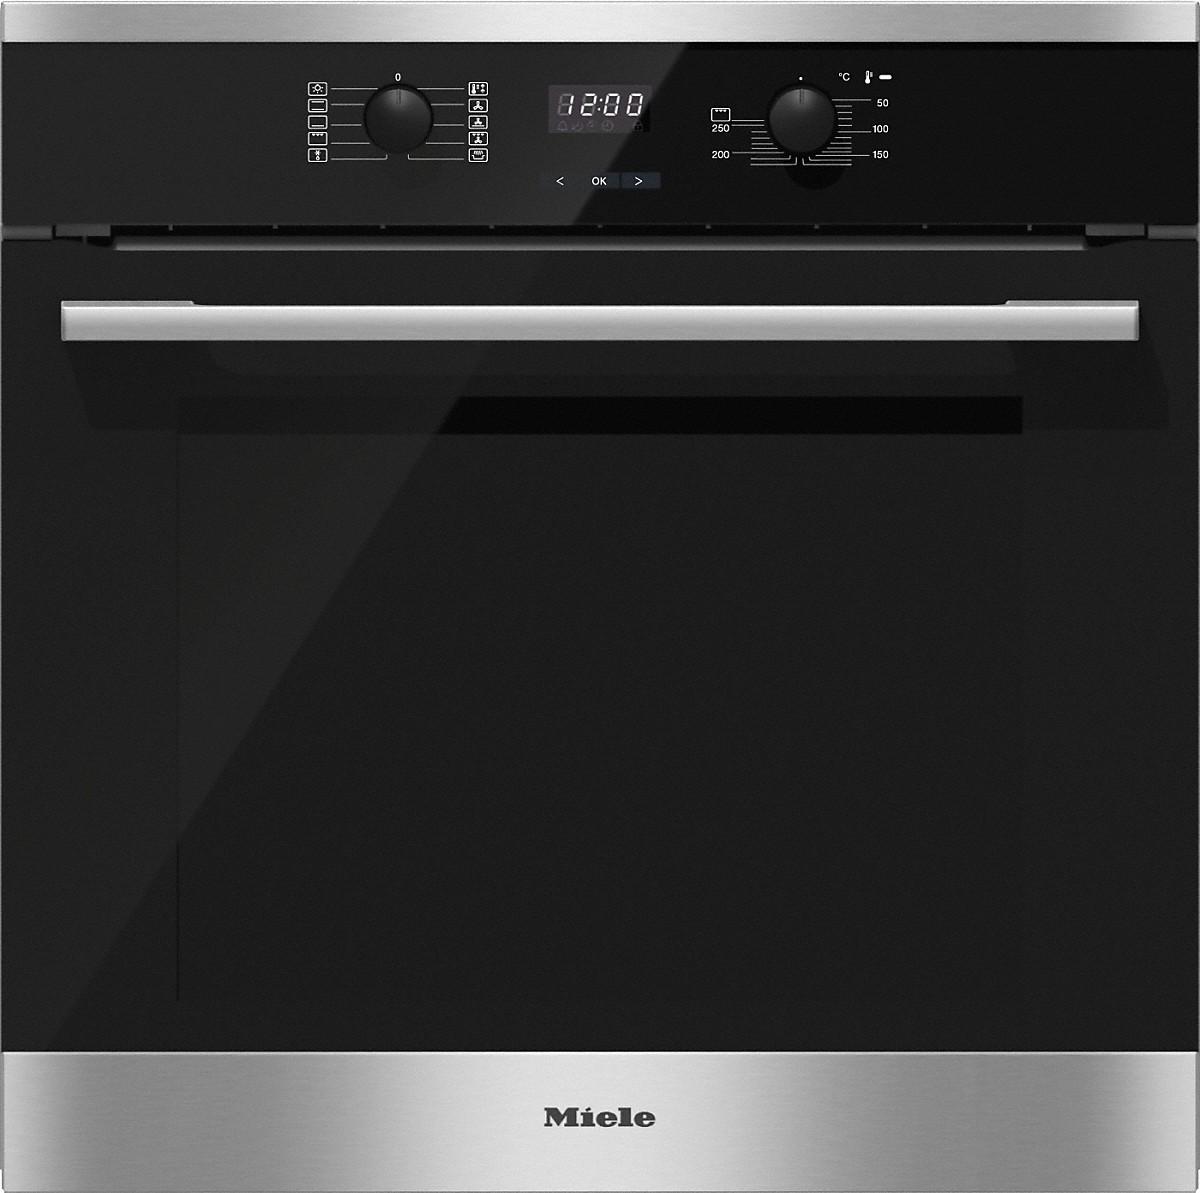 Geschirrspülmaschine Miele Preis = miele h 2561 b backofen